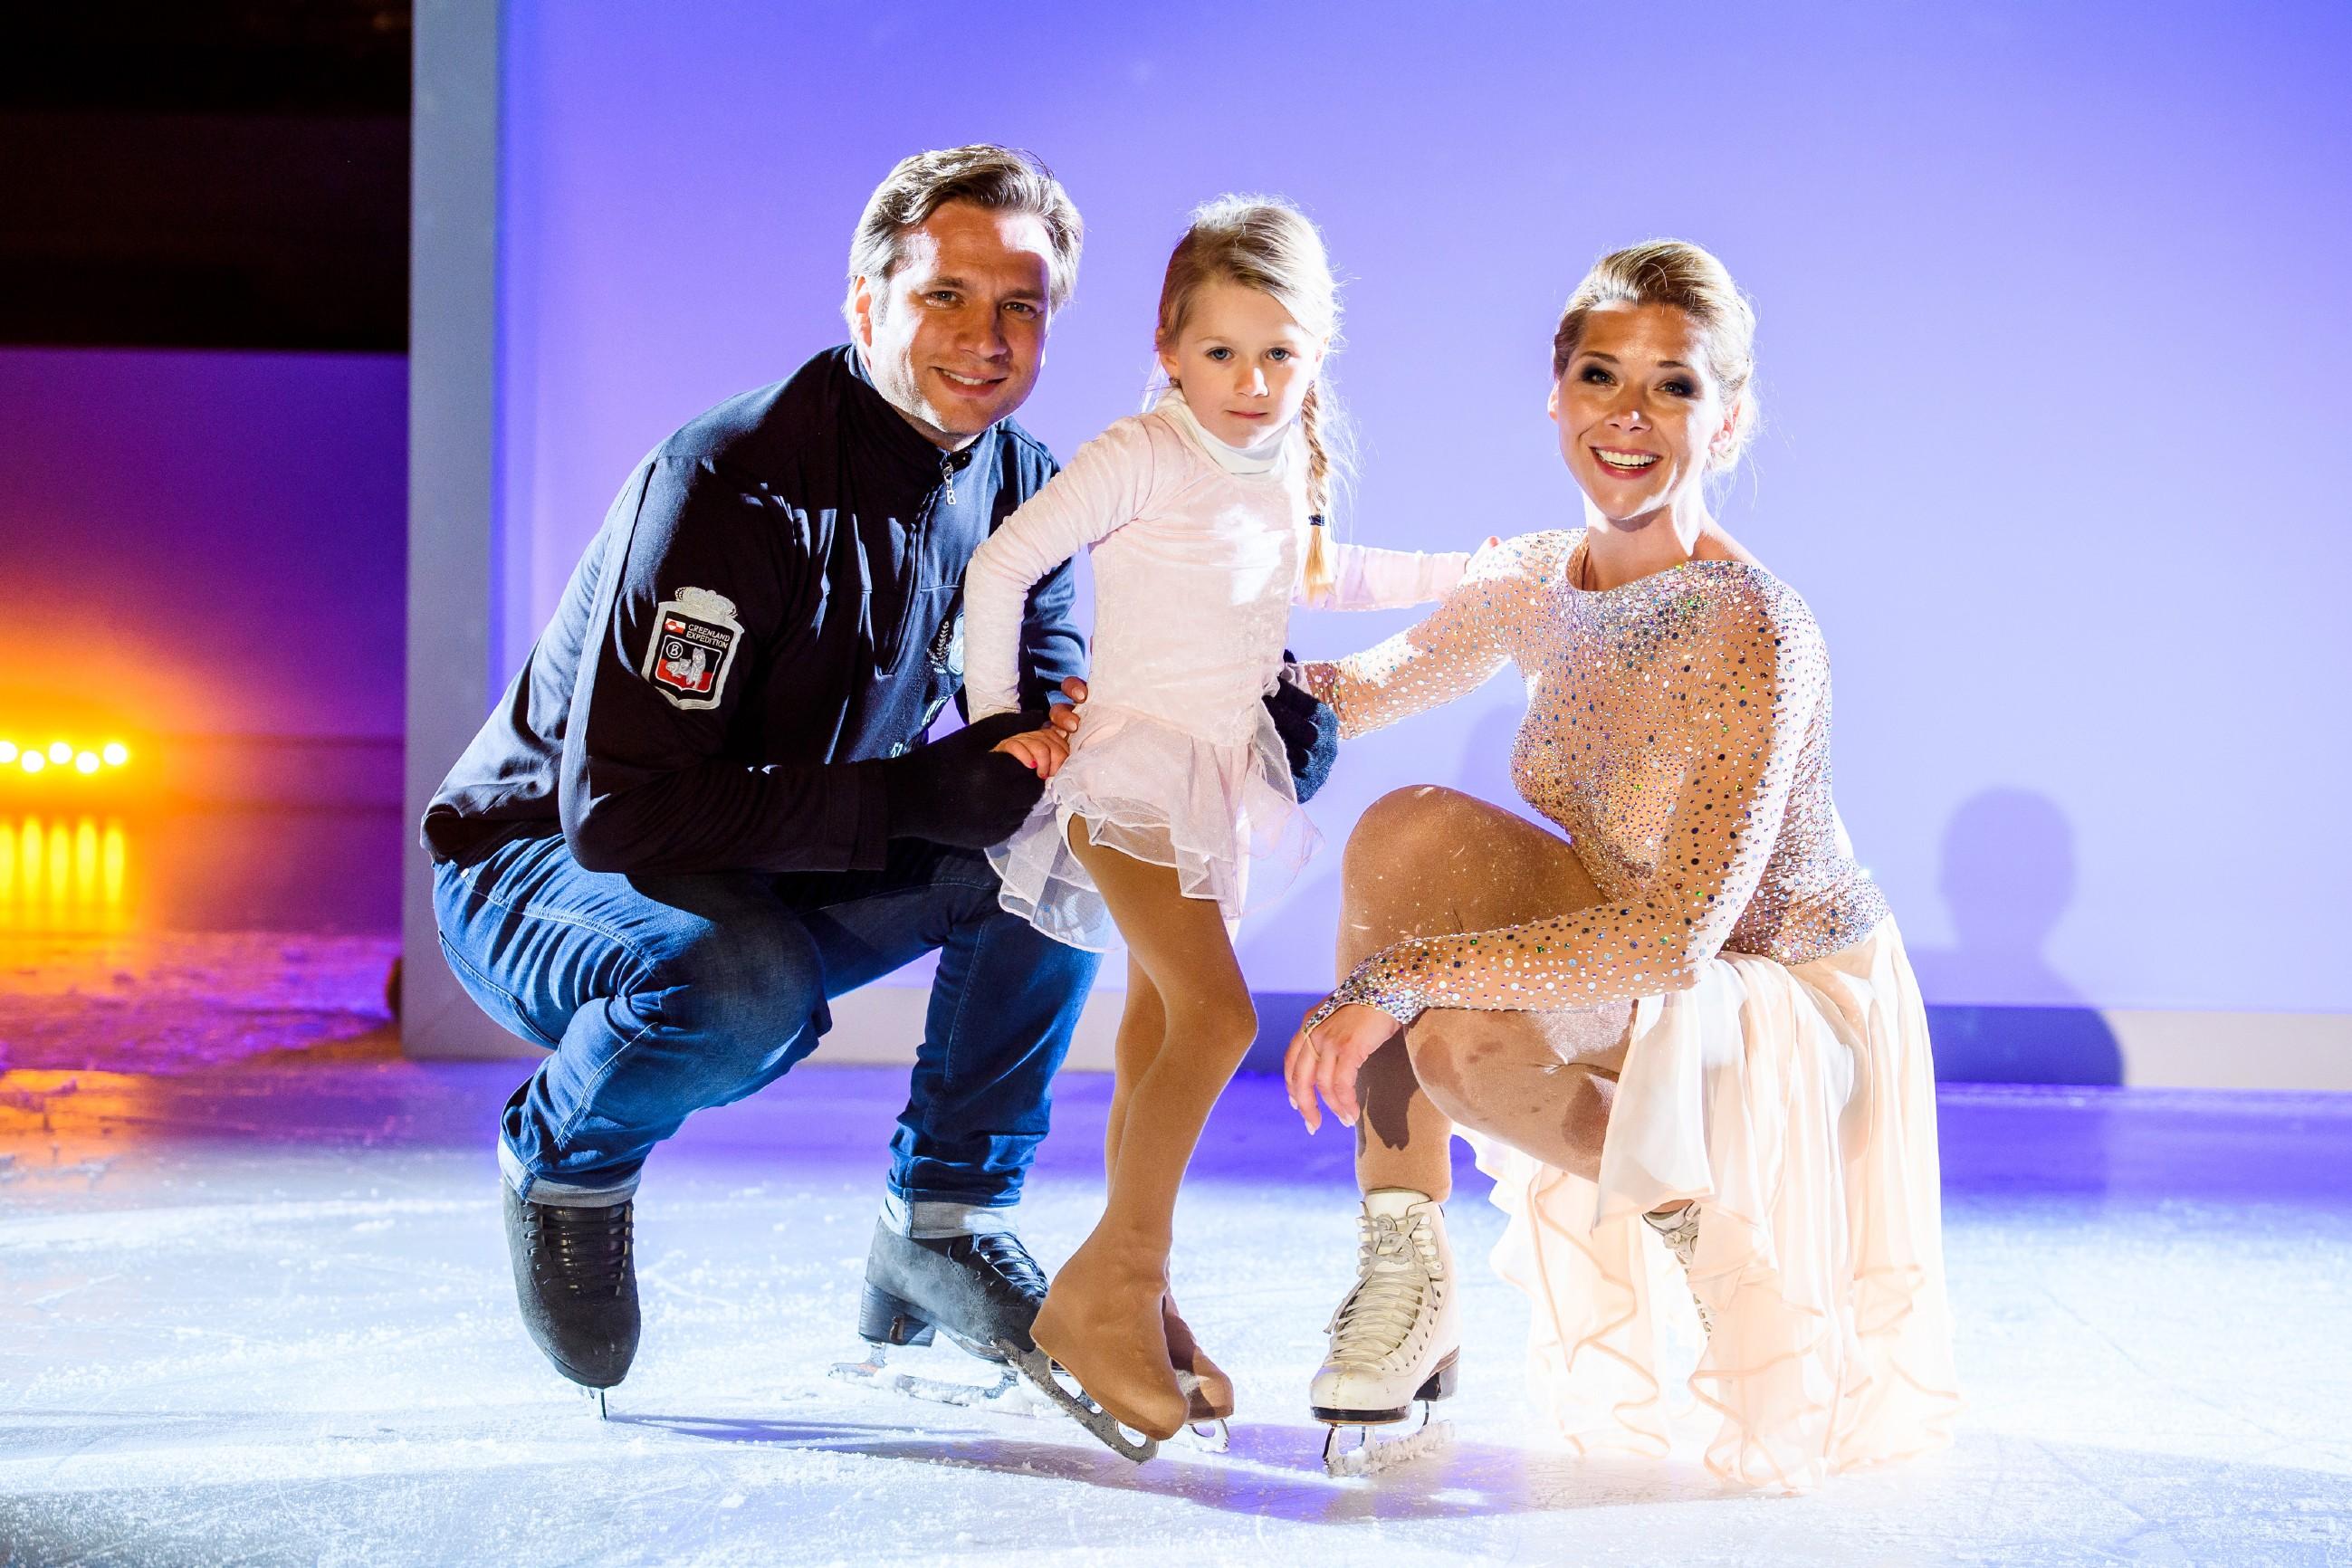 Tanja Szewczenko mit ihrem Mann Norman Jeschke und Tochter Jona.